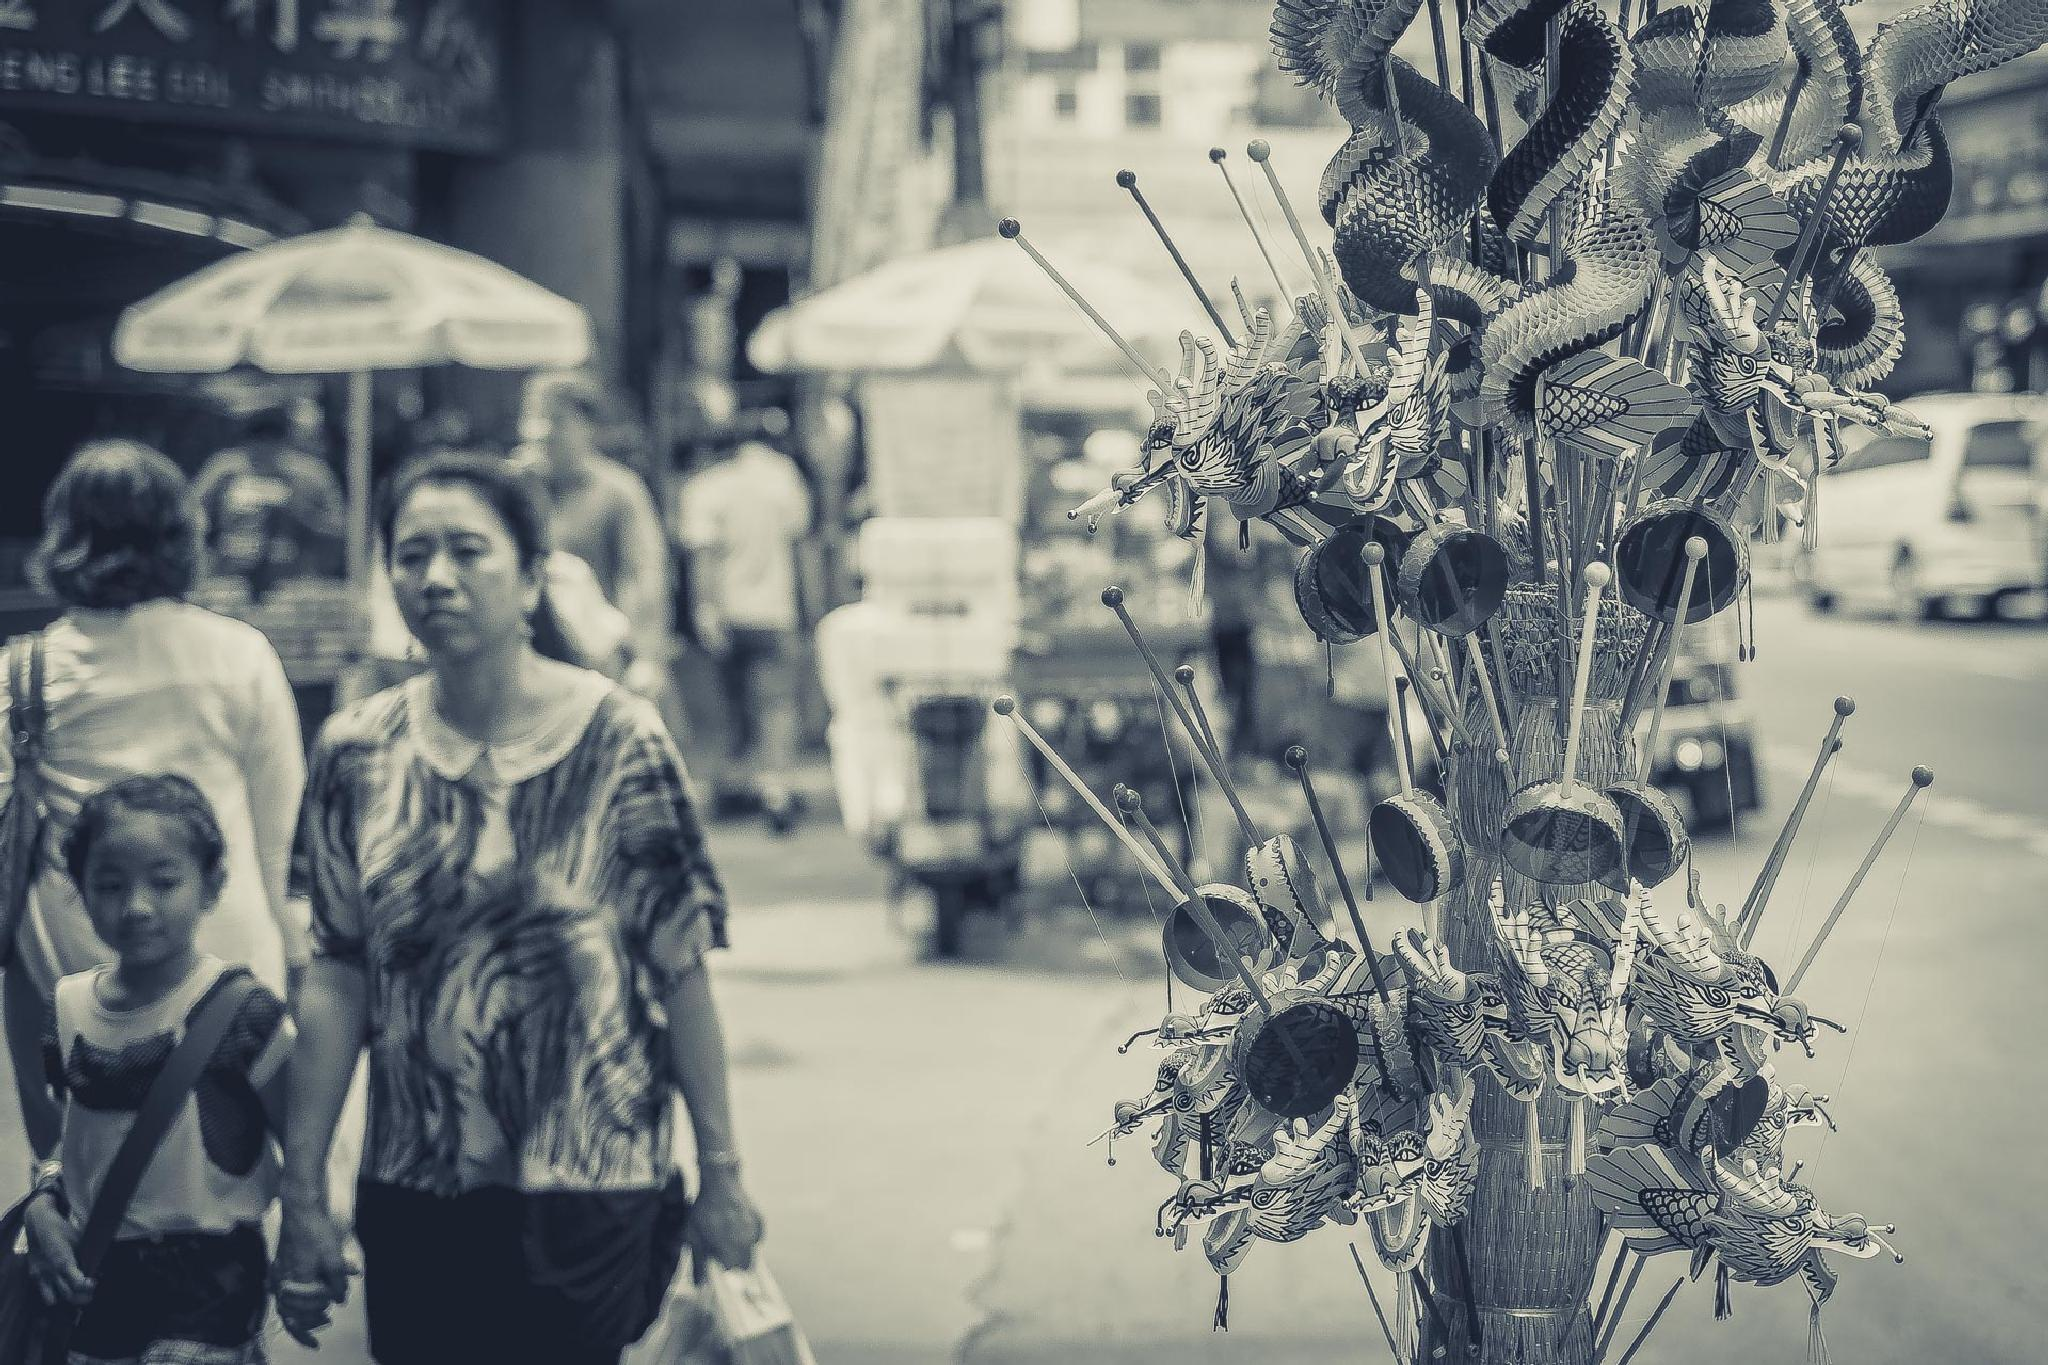 Chinatown by volker.stetter